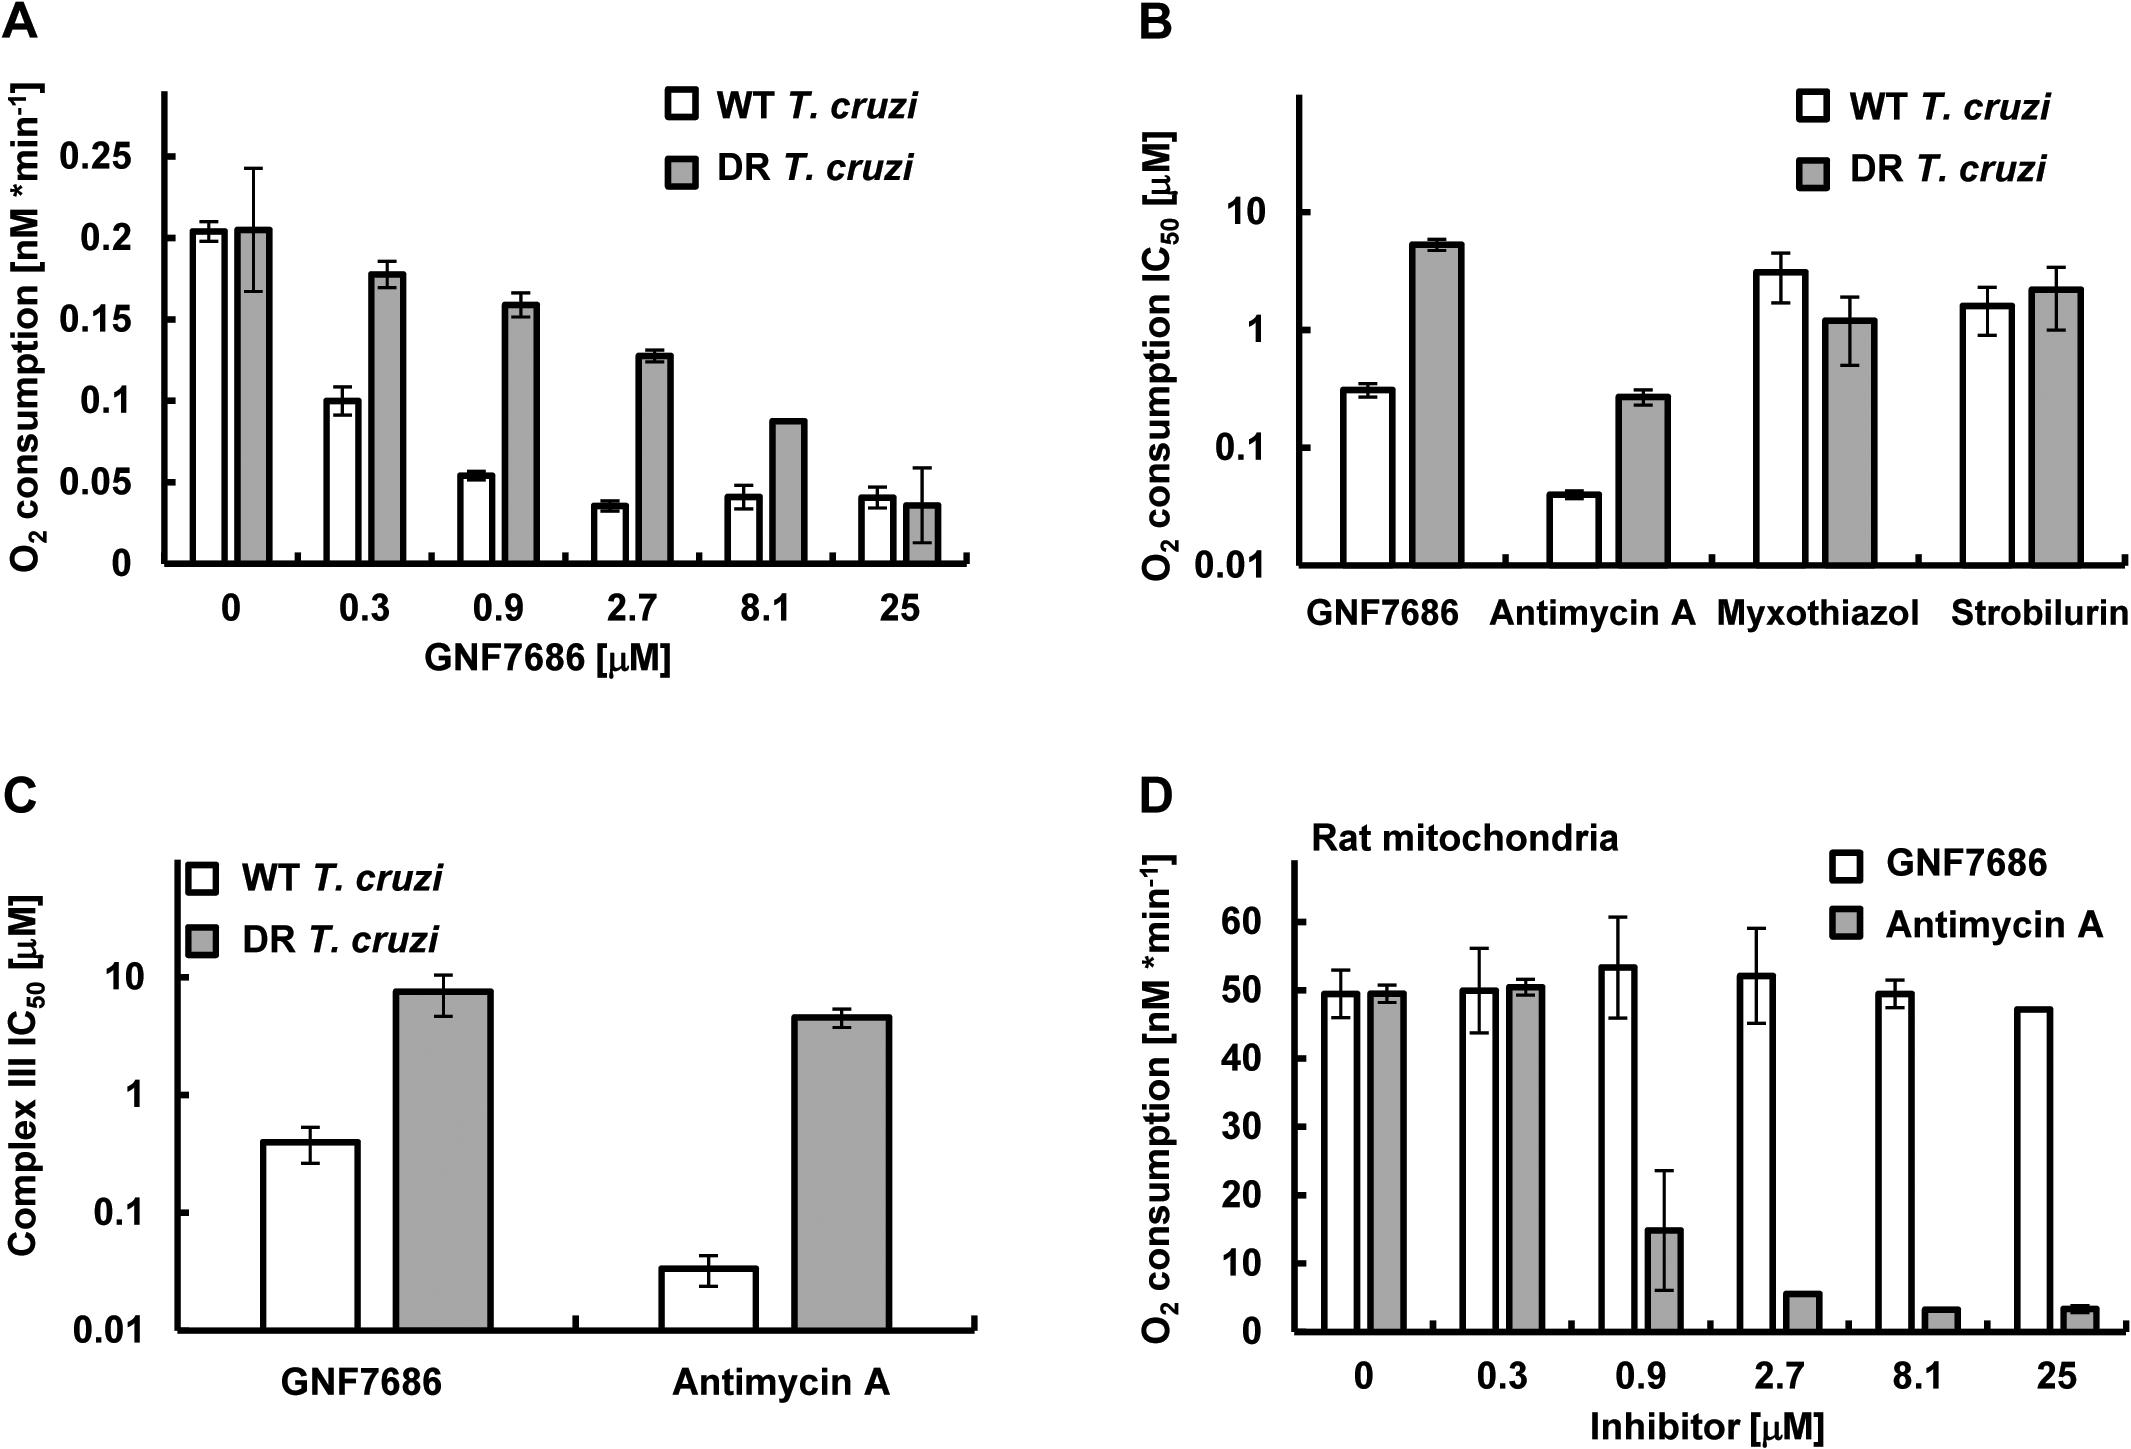 GNF7686 inhibits cellular respiration and cytochrome <i>b</i> function in <i>T</i>. <i>cruzi</i>.